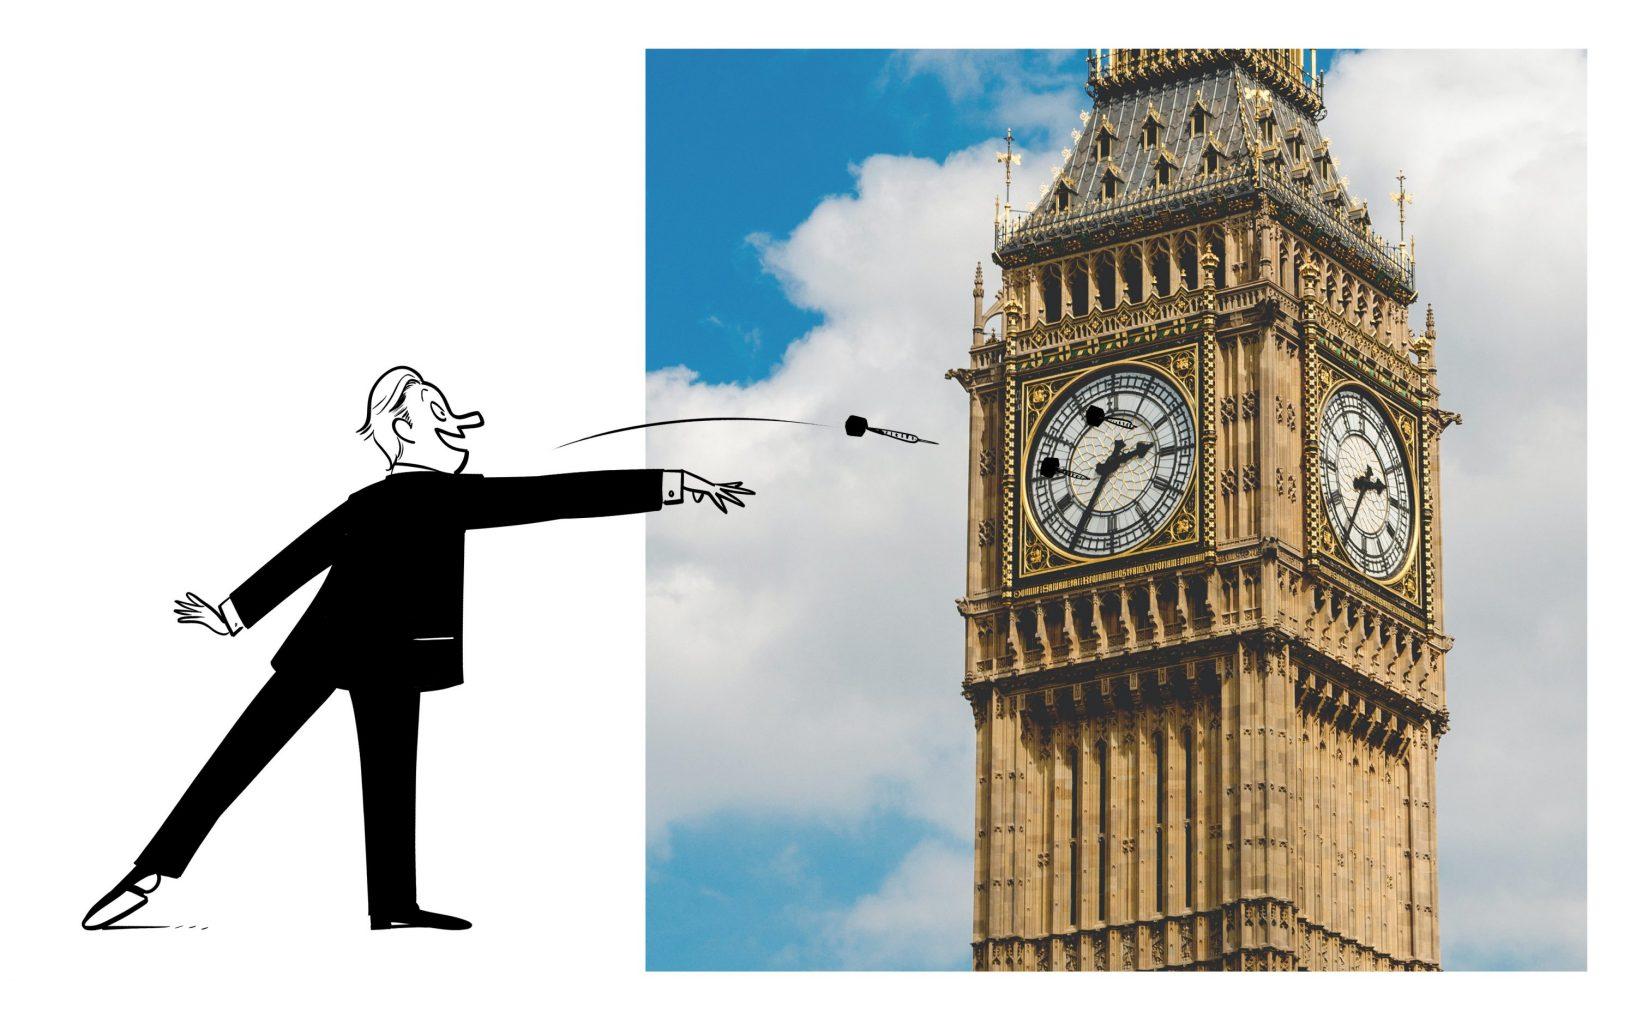 Using Big Ben as darts board